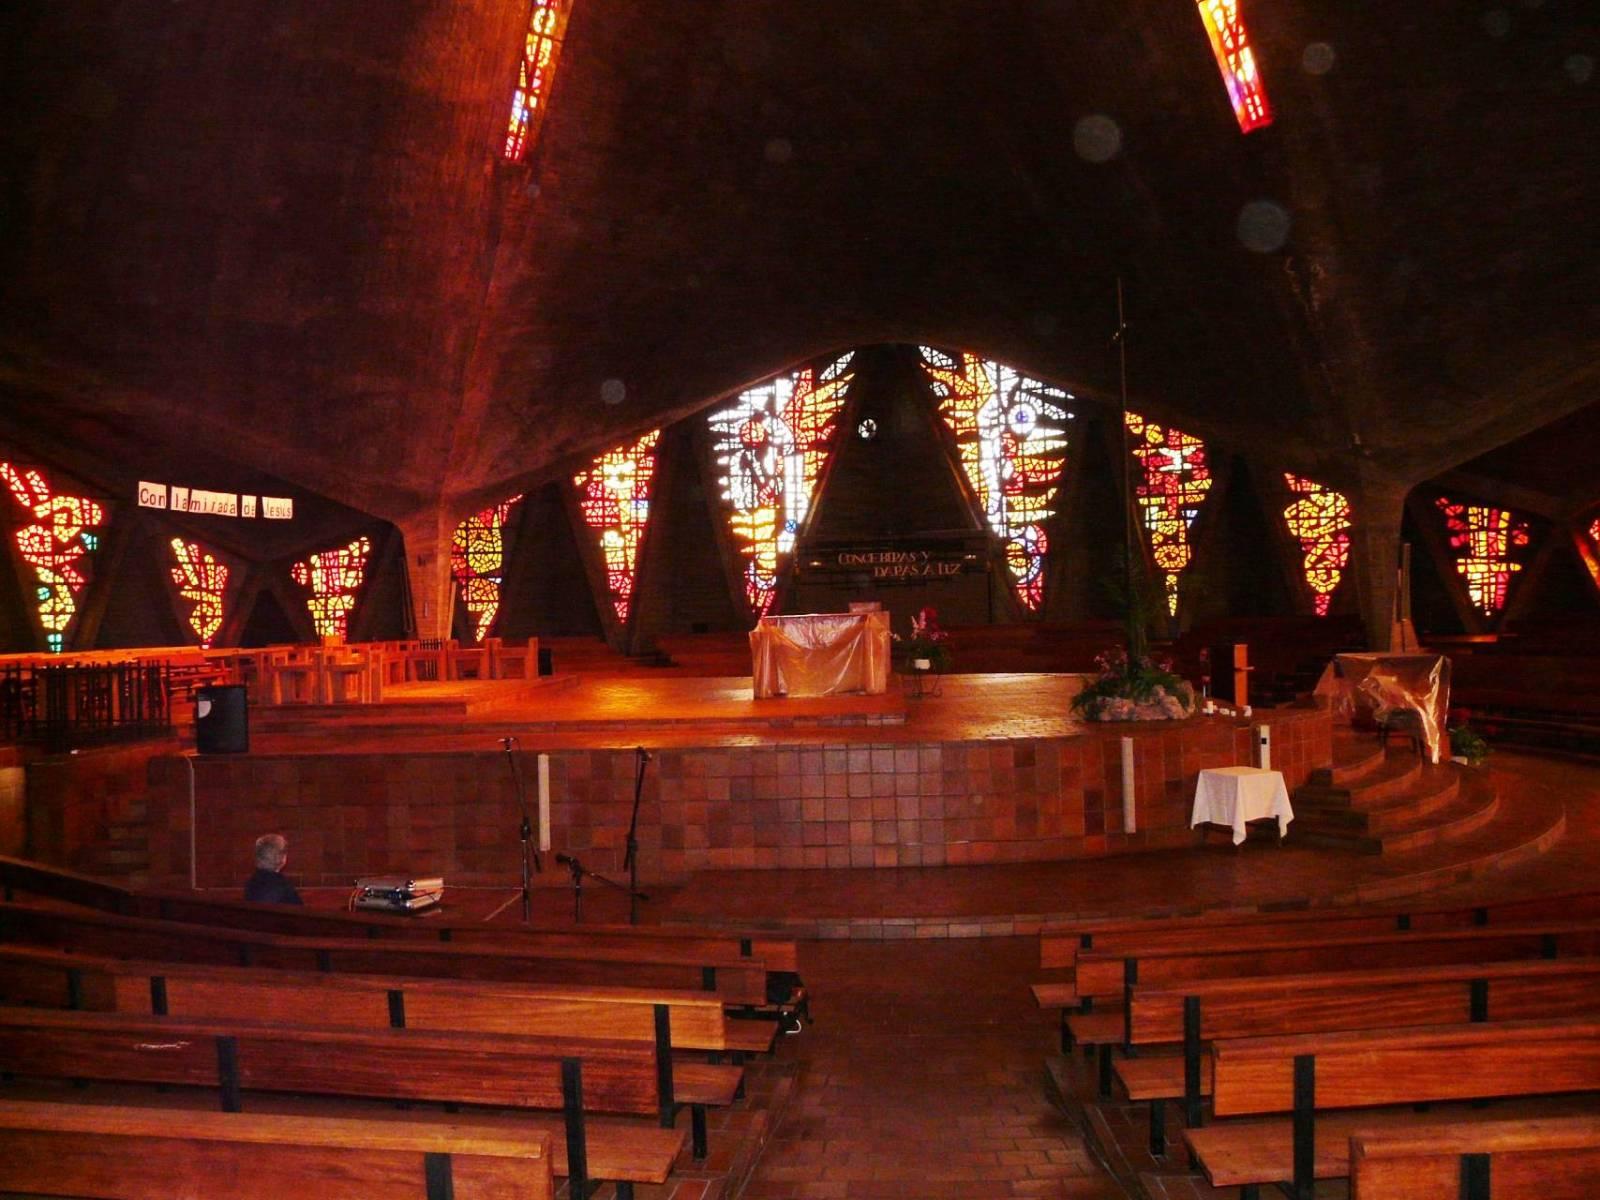 Parroquia san crist bal descubriendo madrid iglesia de - Ciudad pegaso madrid ...